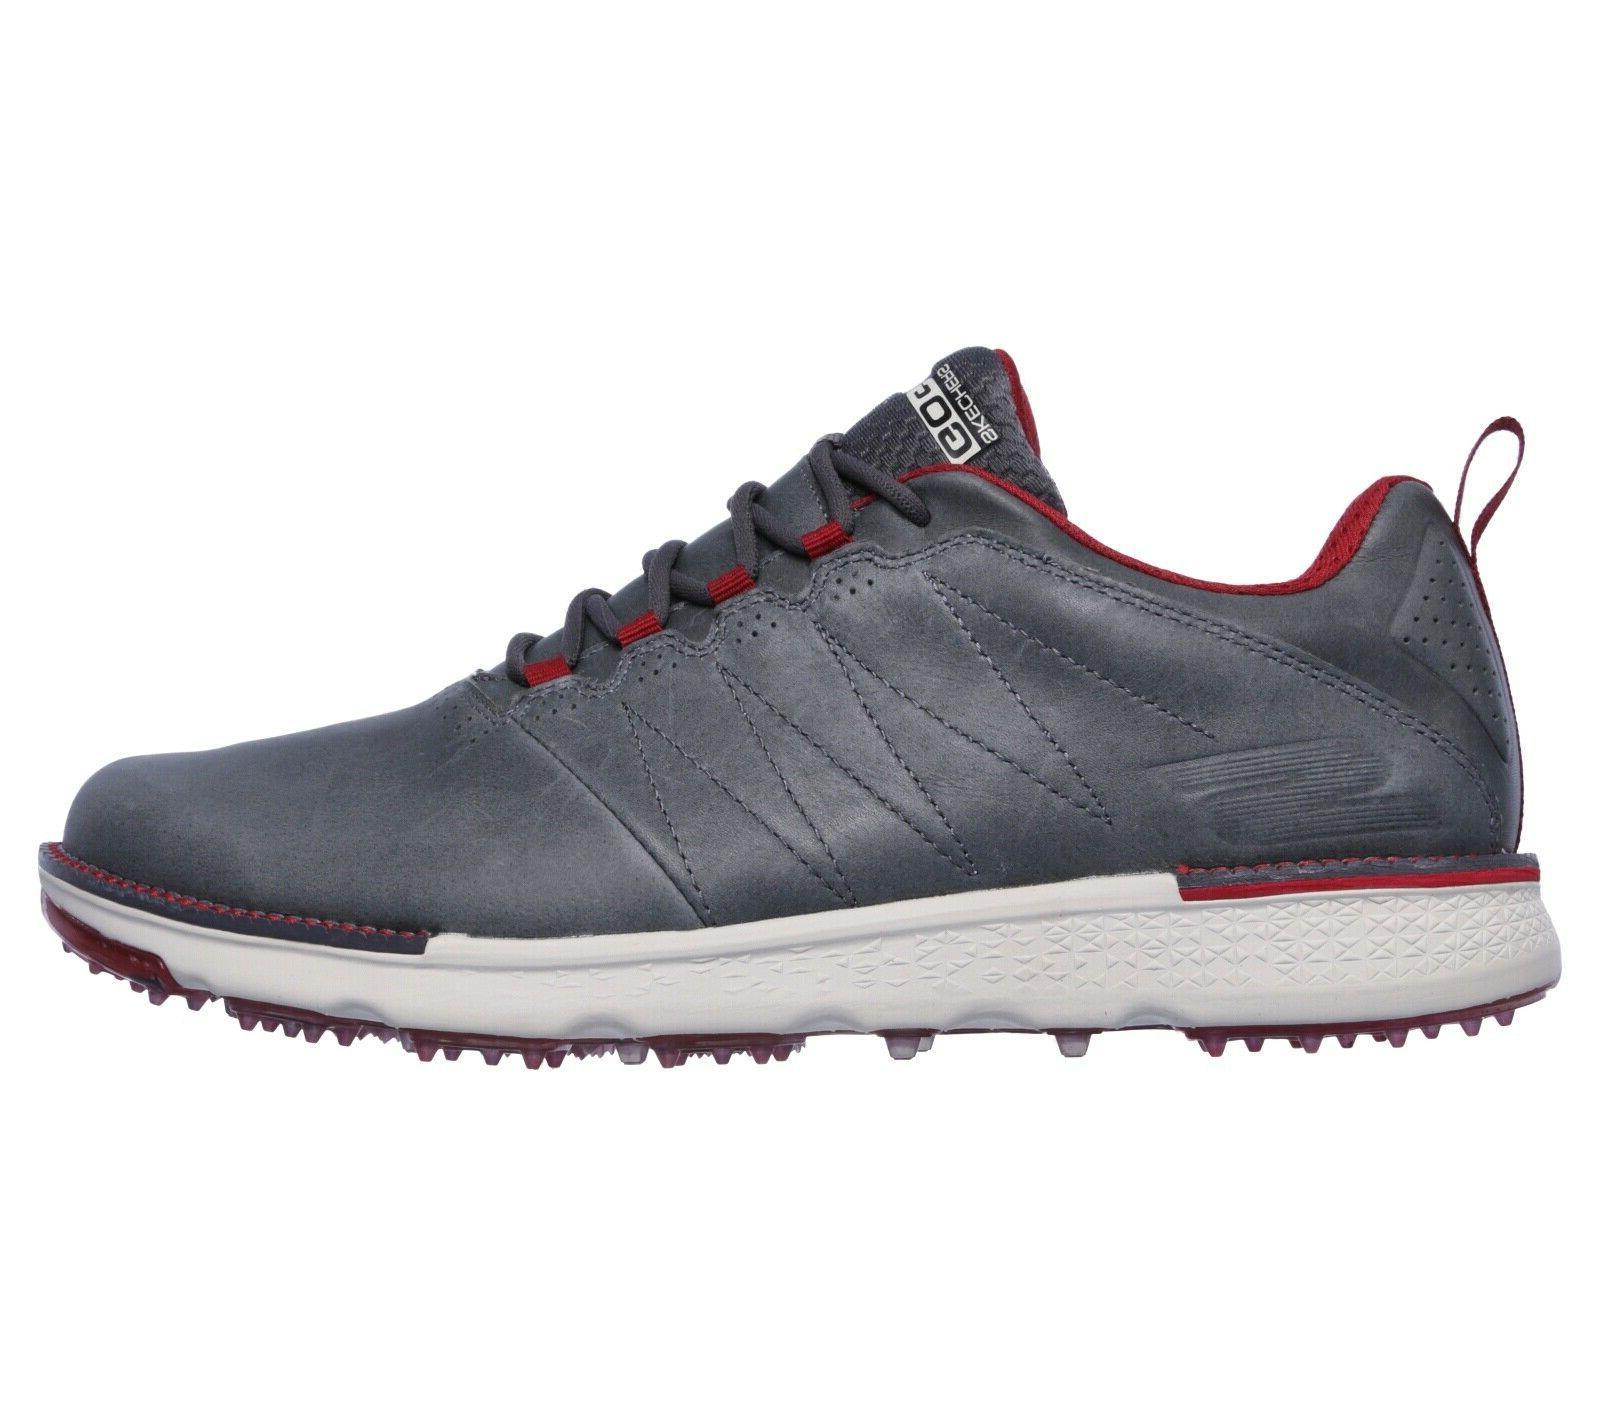 Skechers Go Golf V.3 Shoes-Style